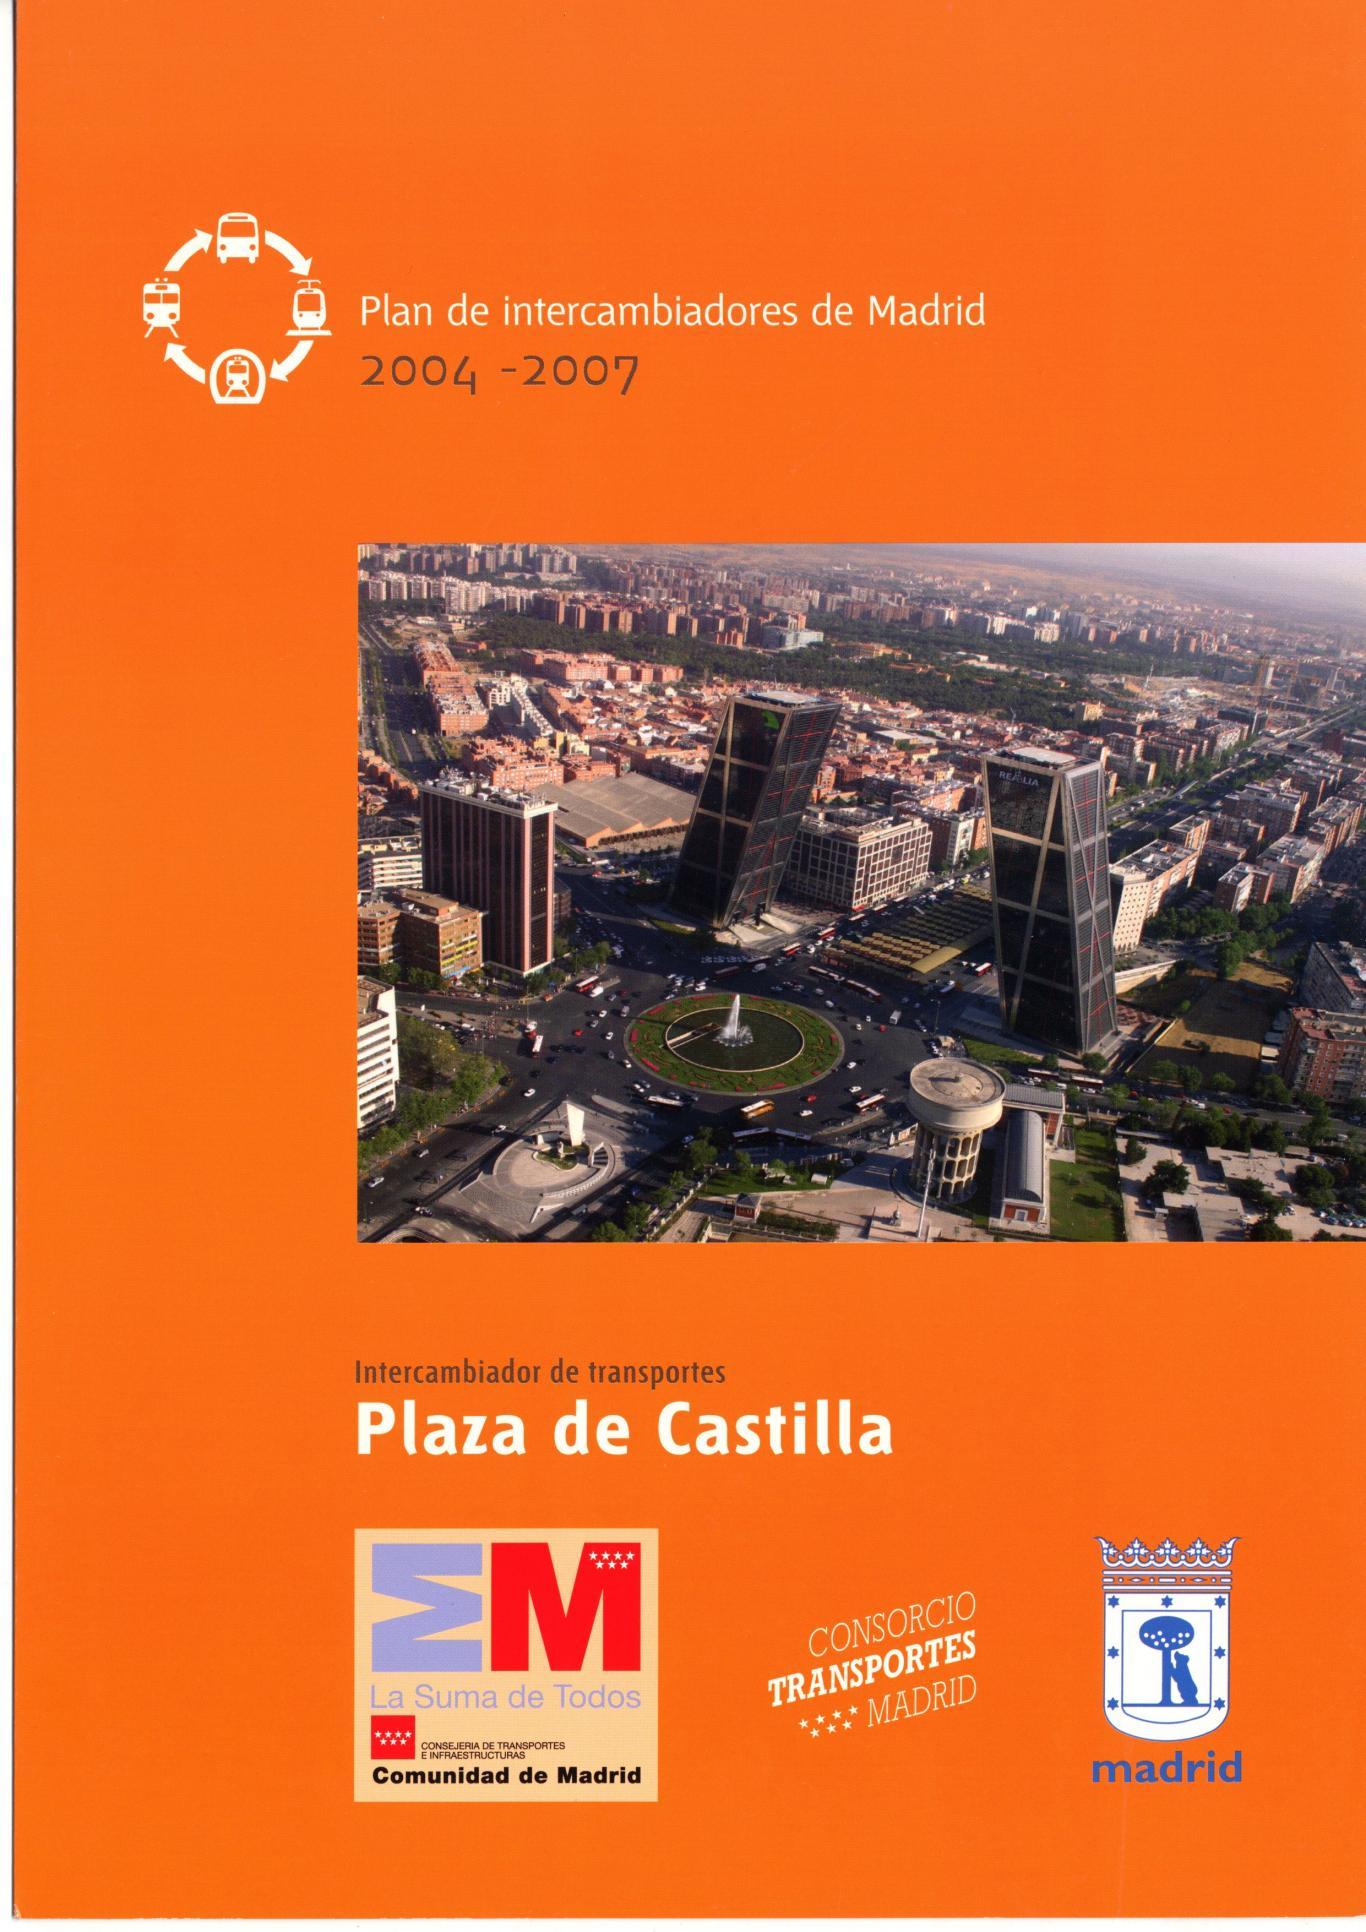 Portada intercambiador Plaza de Castilla